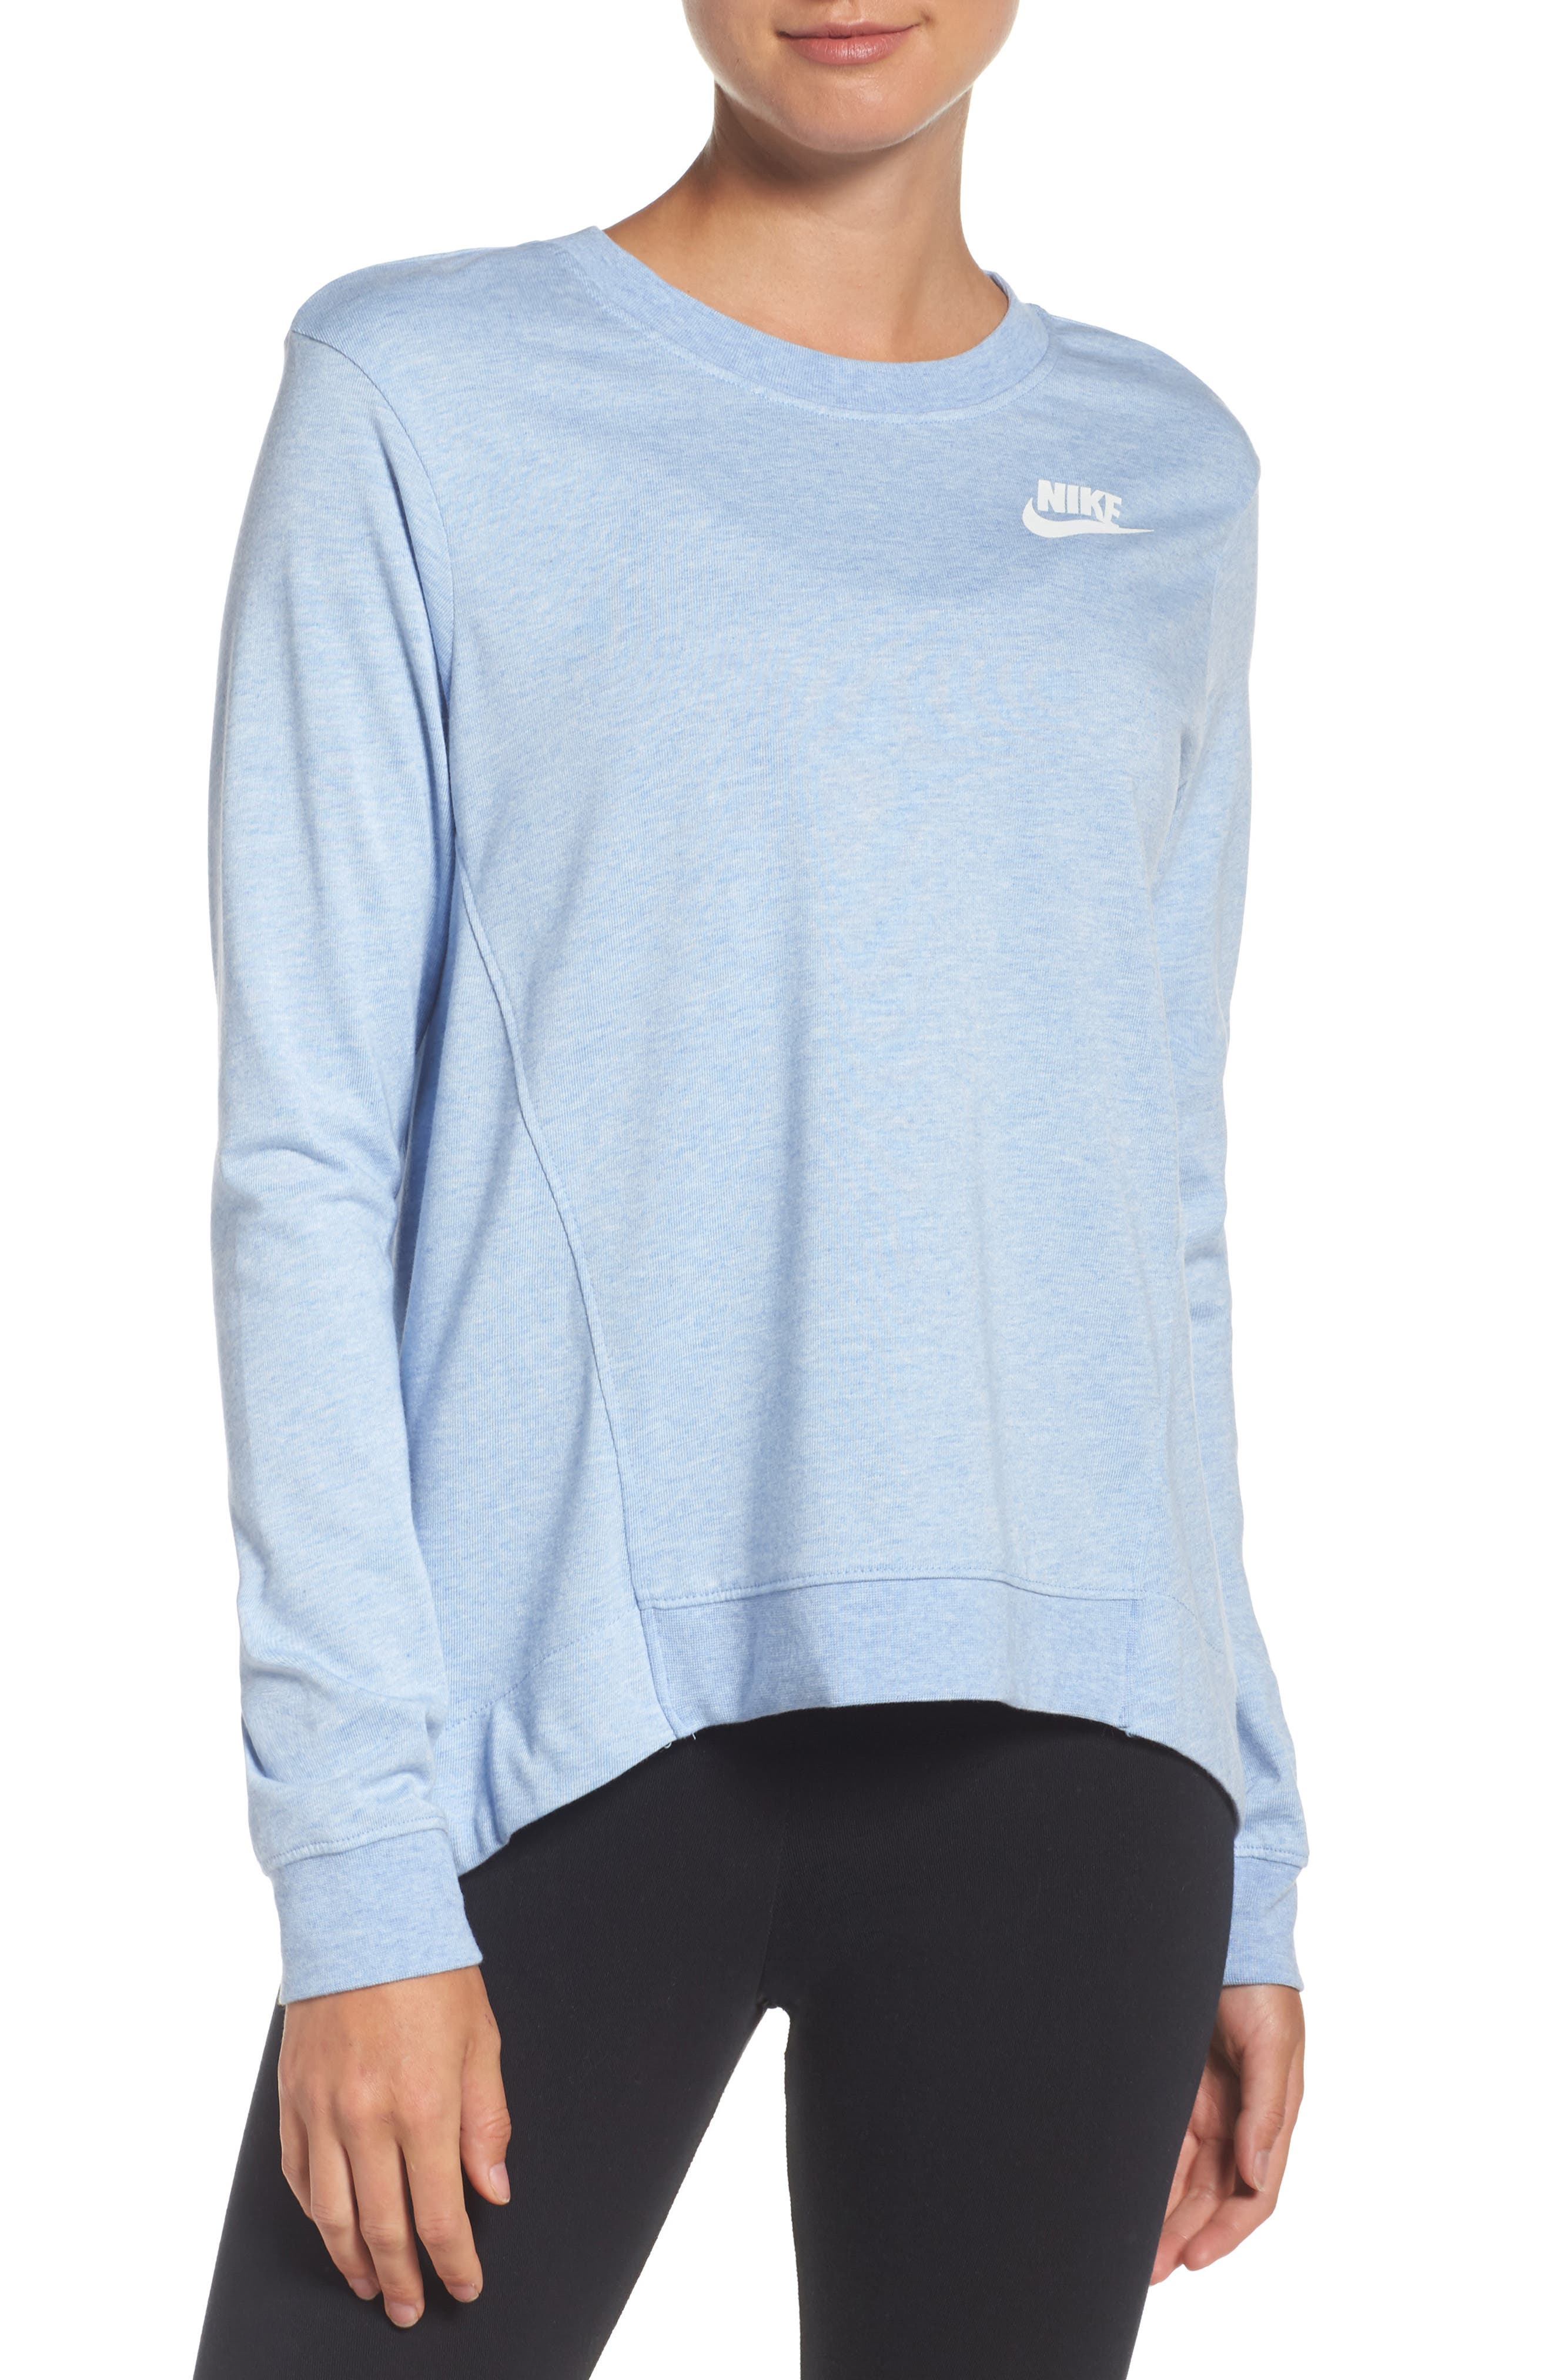 Nike Gym Crewneck Pullover